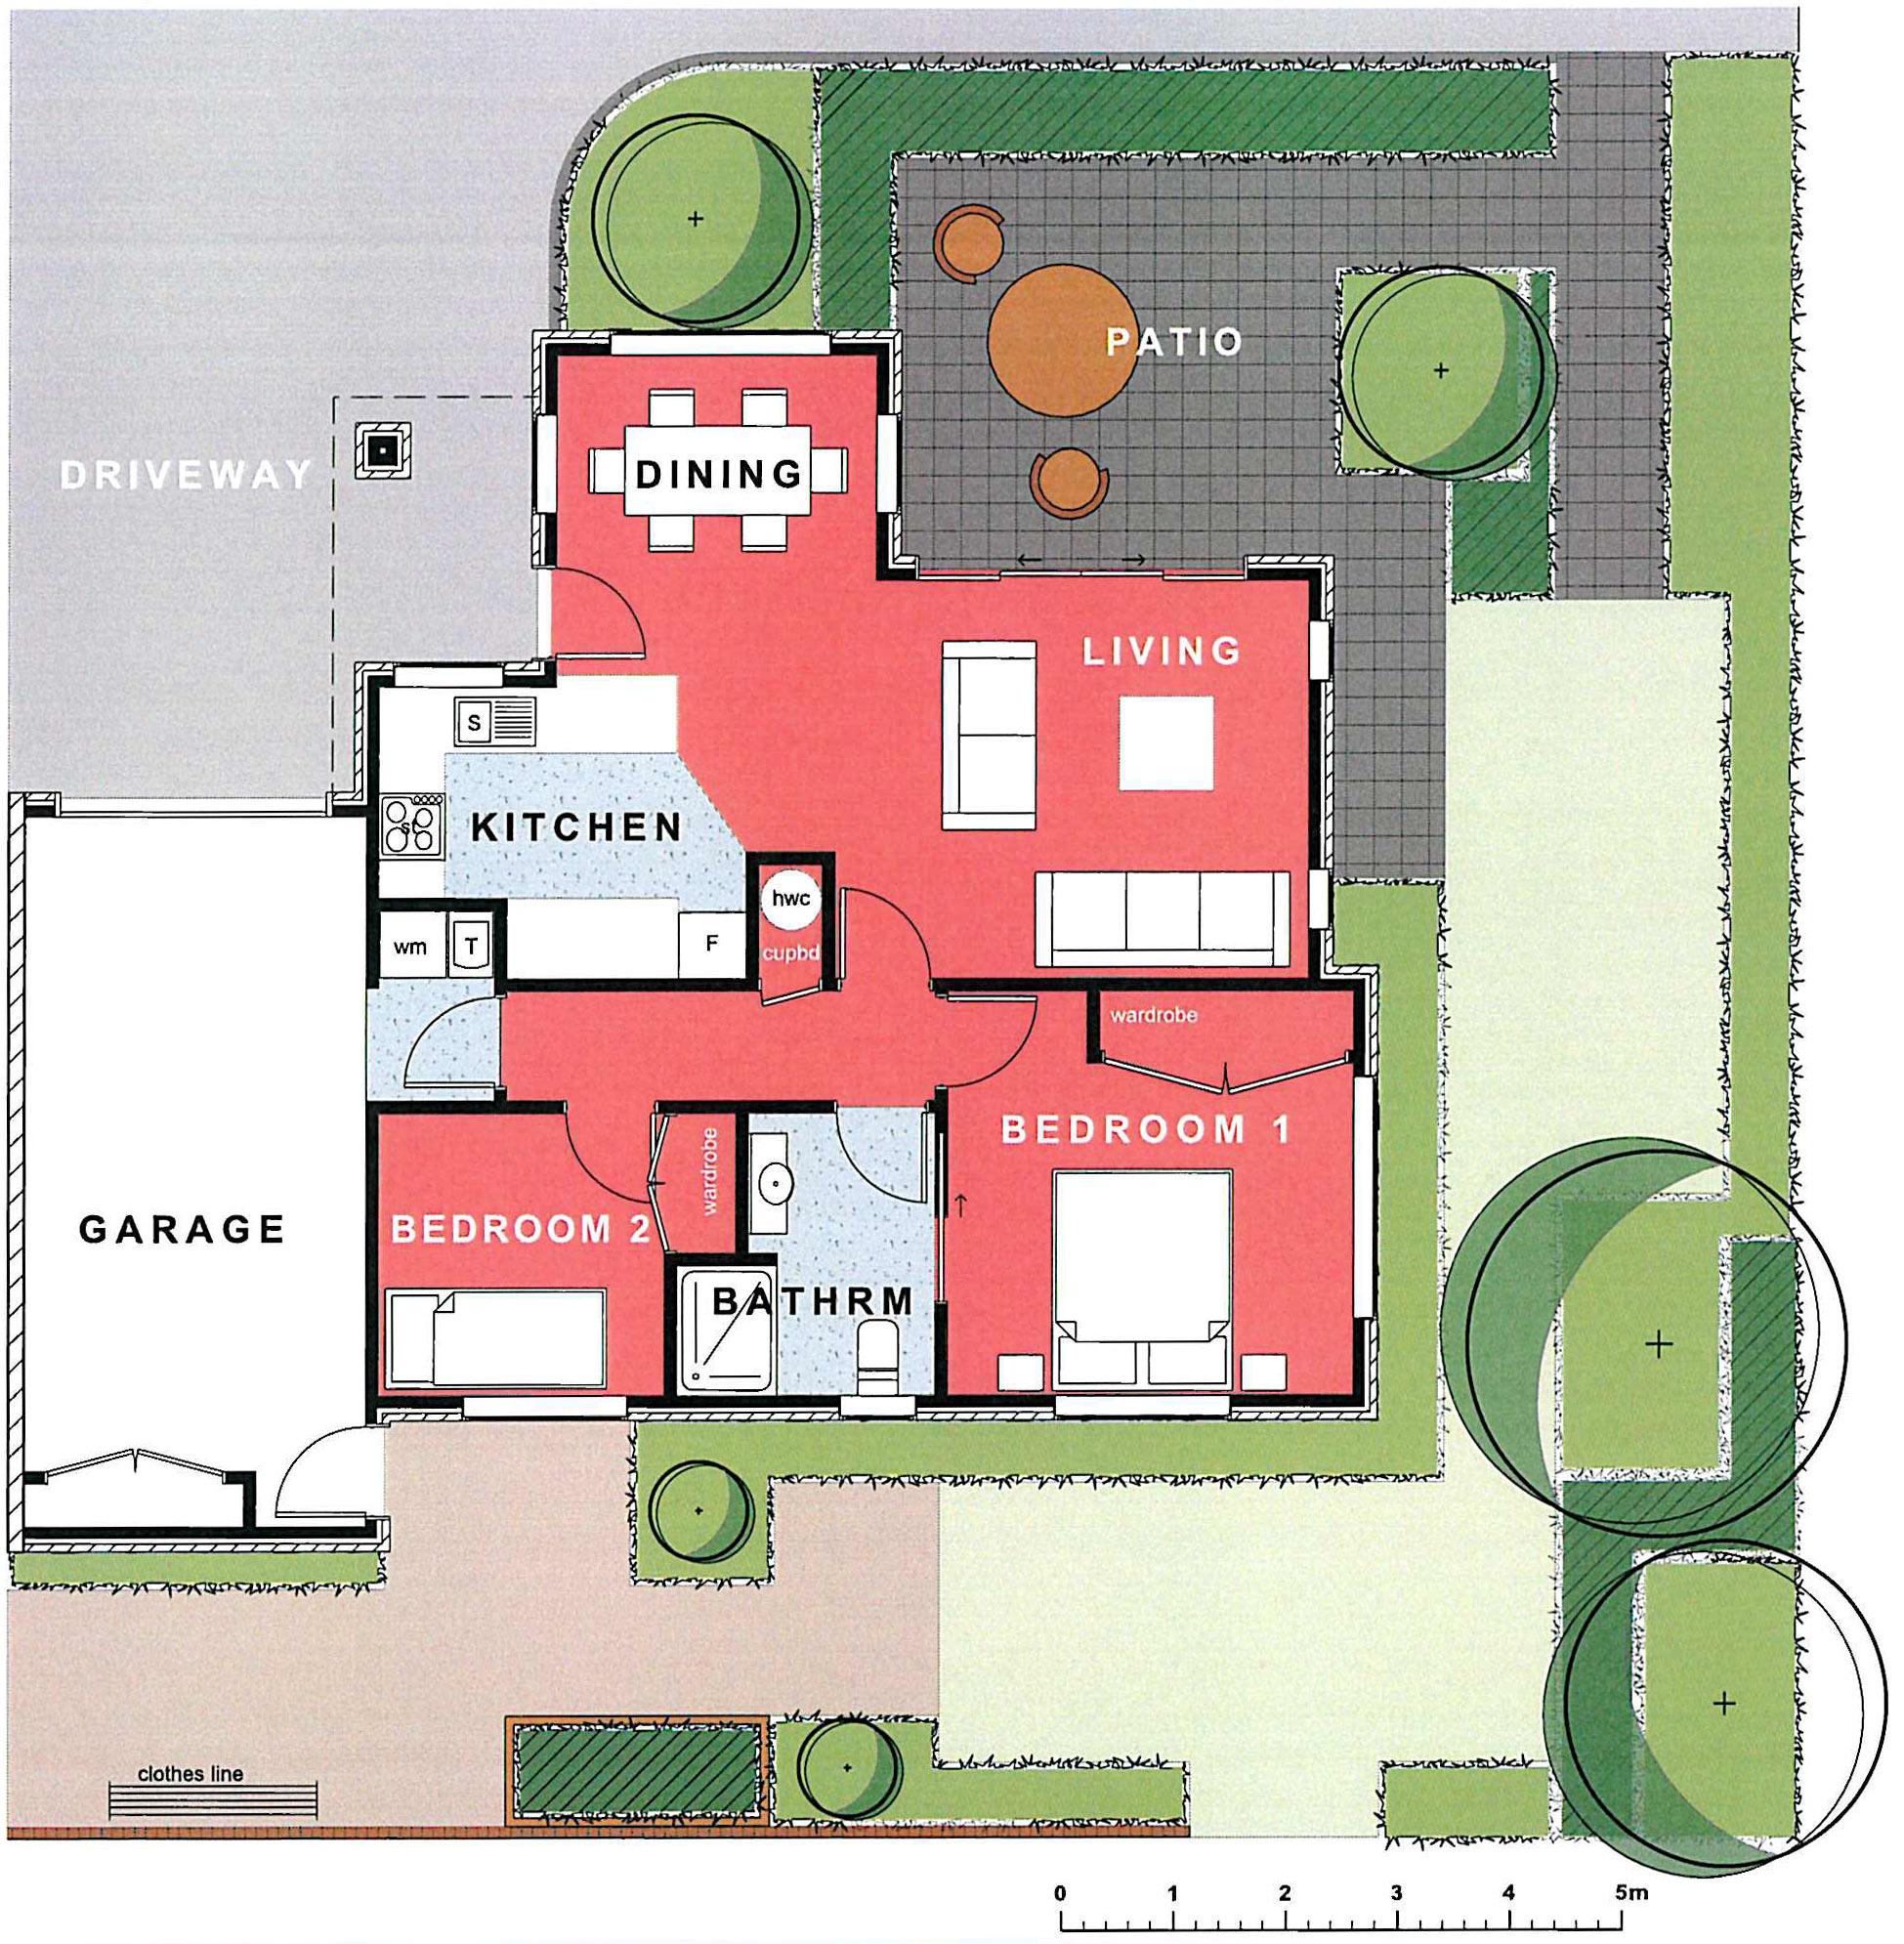 Thorrington Villa #34 Floorplan - Archer Group